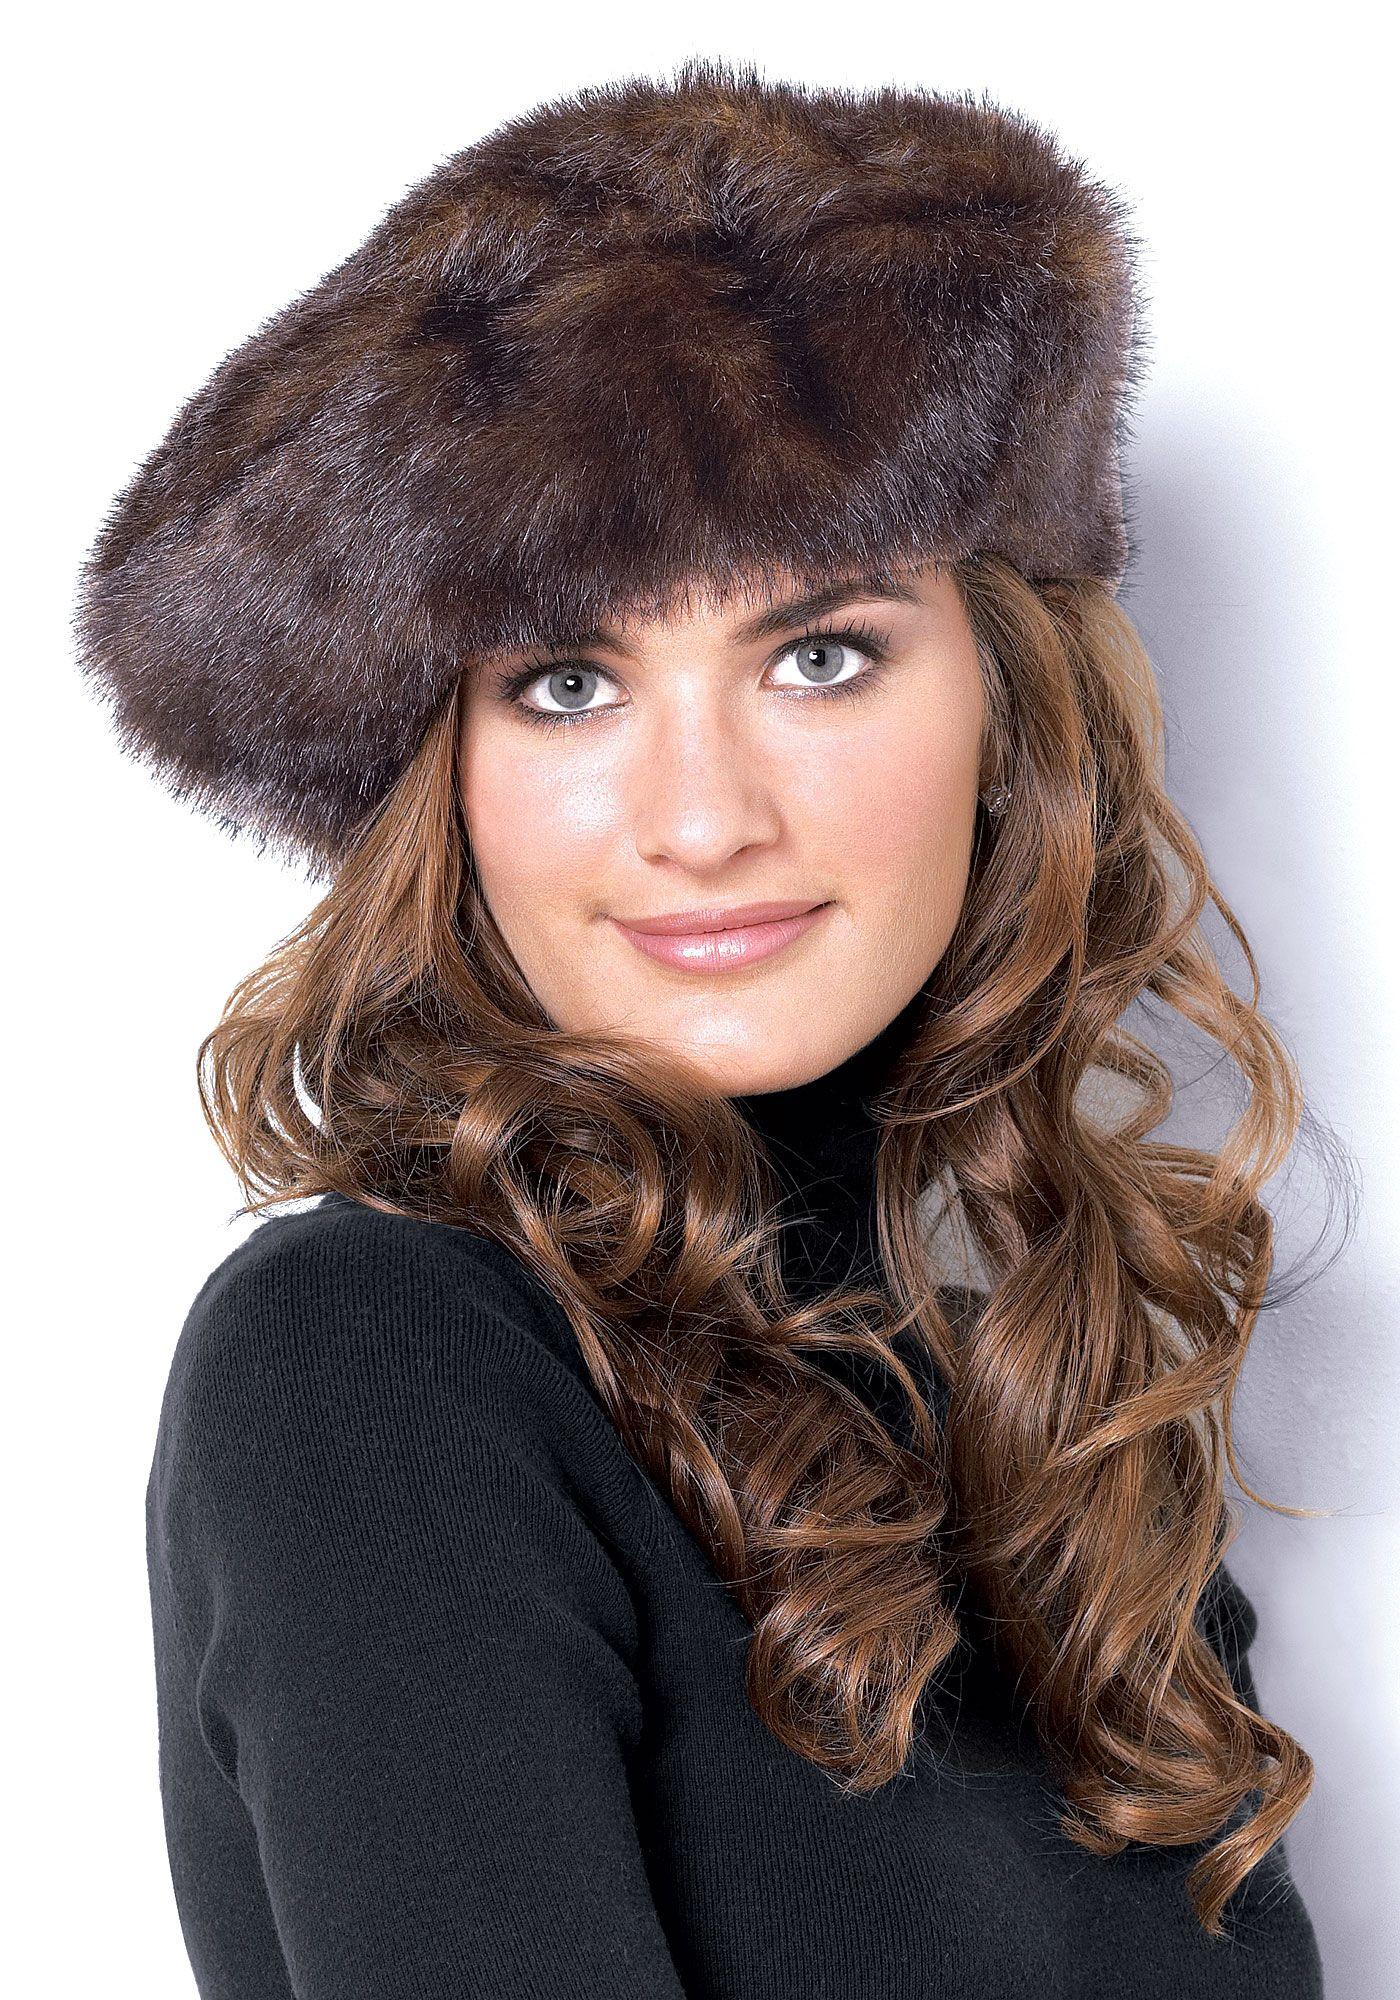 60de9c45e $49 Tam style hat in sable | Winter Wedding Ideas | Fabulous furs ...